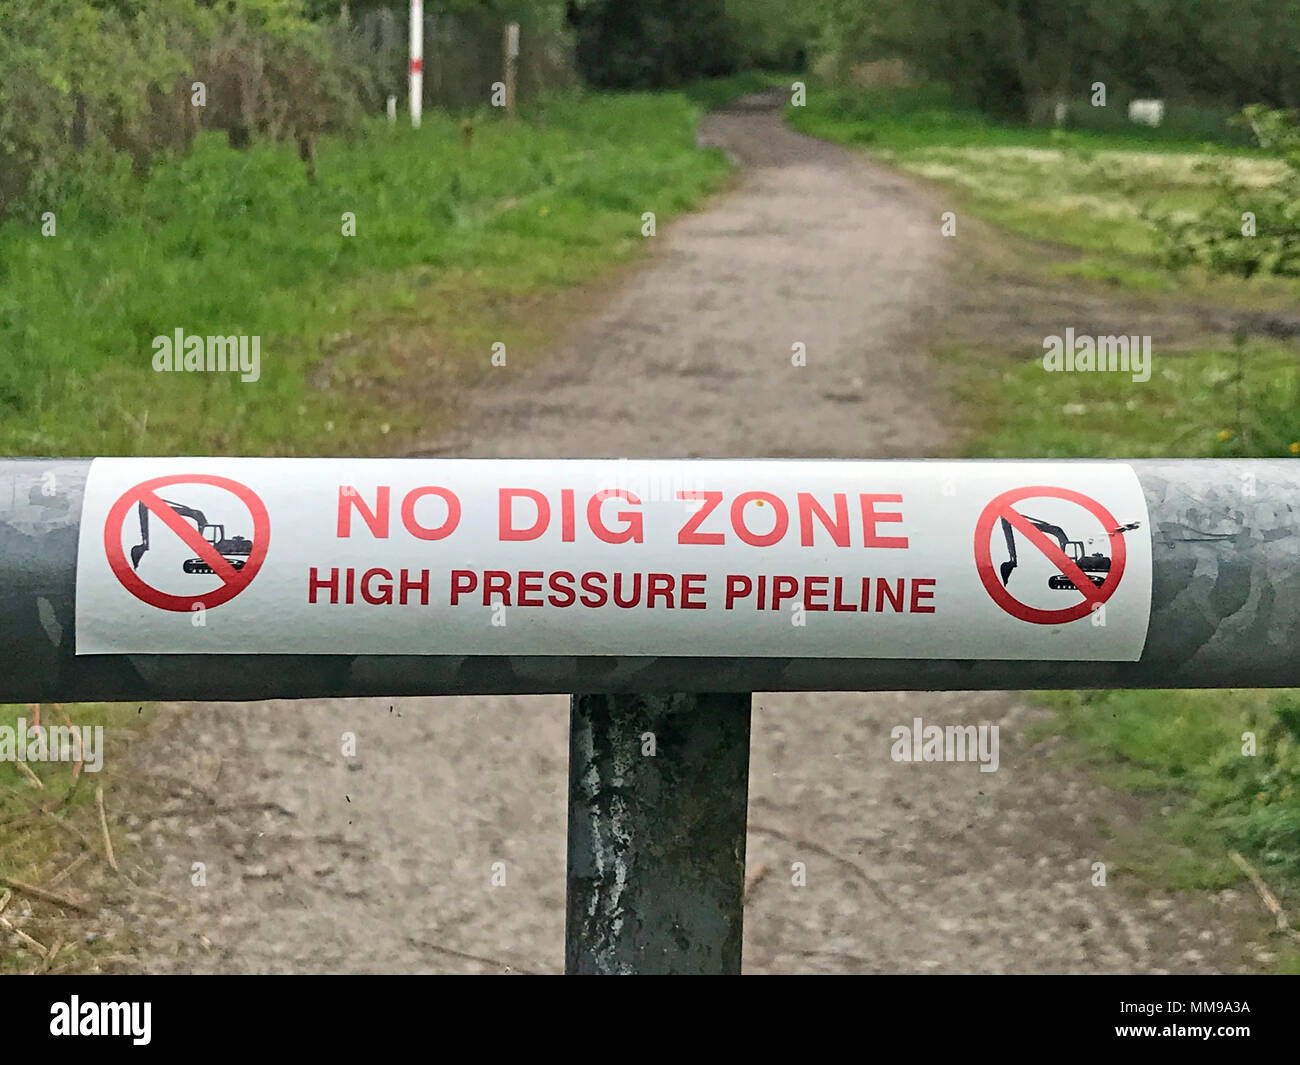 GoTonysmith,@HotpixUK,sign,No,Dig,Zone,High,Pressure,Pipeline,Walton,England,UK,GB,Transpennine,trail,gate,no digging,danger,gas,oil,services,No Dig Sticker